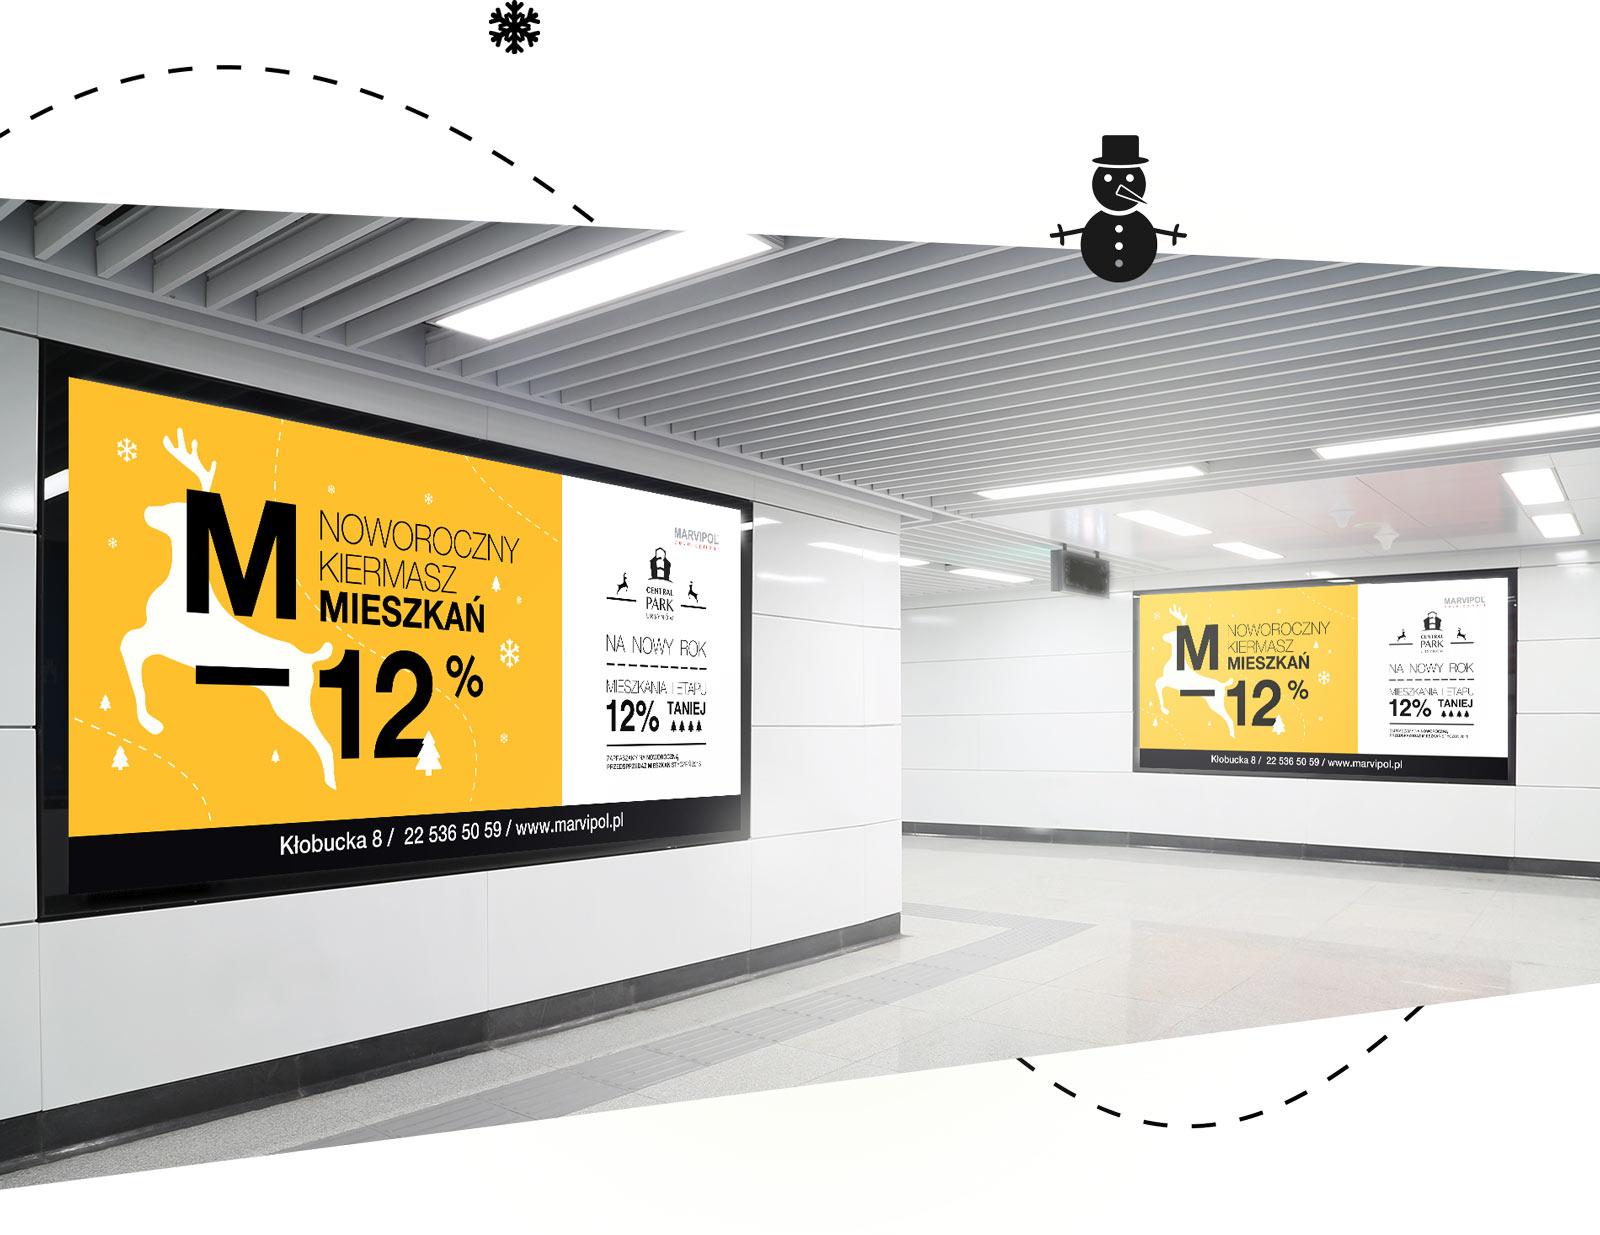 https://peppermint.pl/wp-content/uploads/2018/09/metro-1.jpg